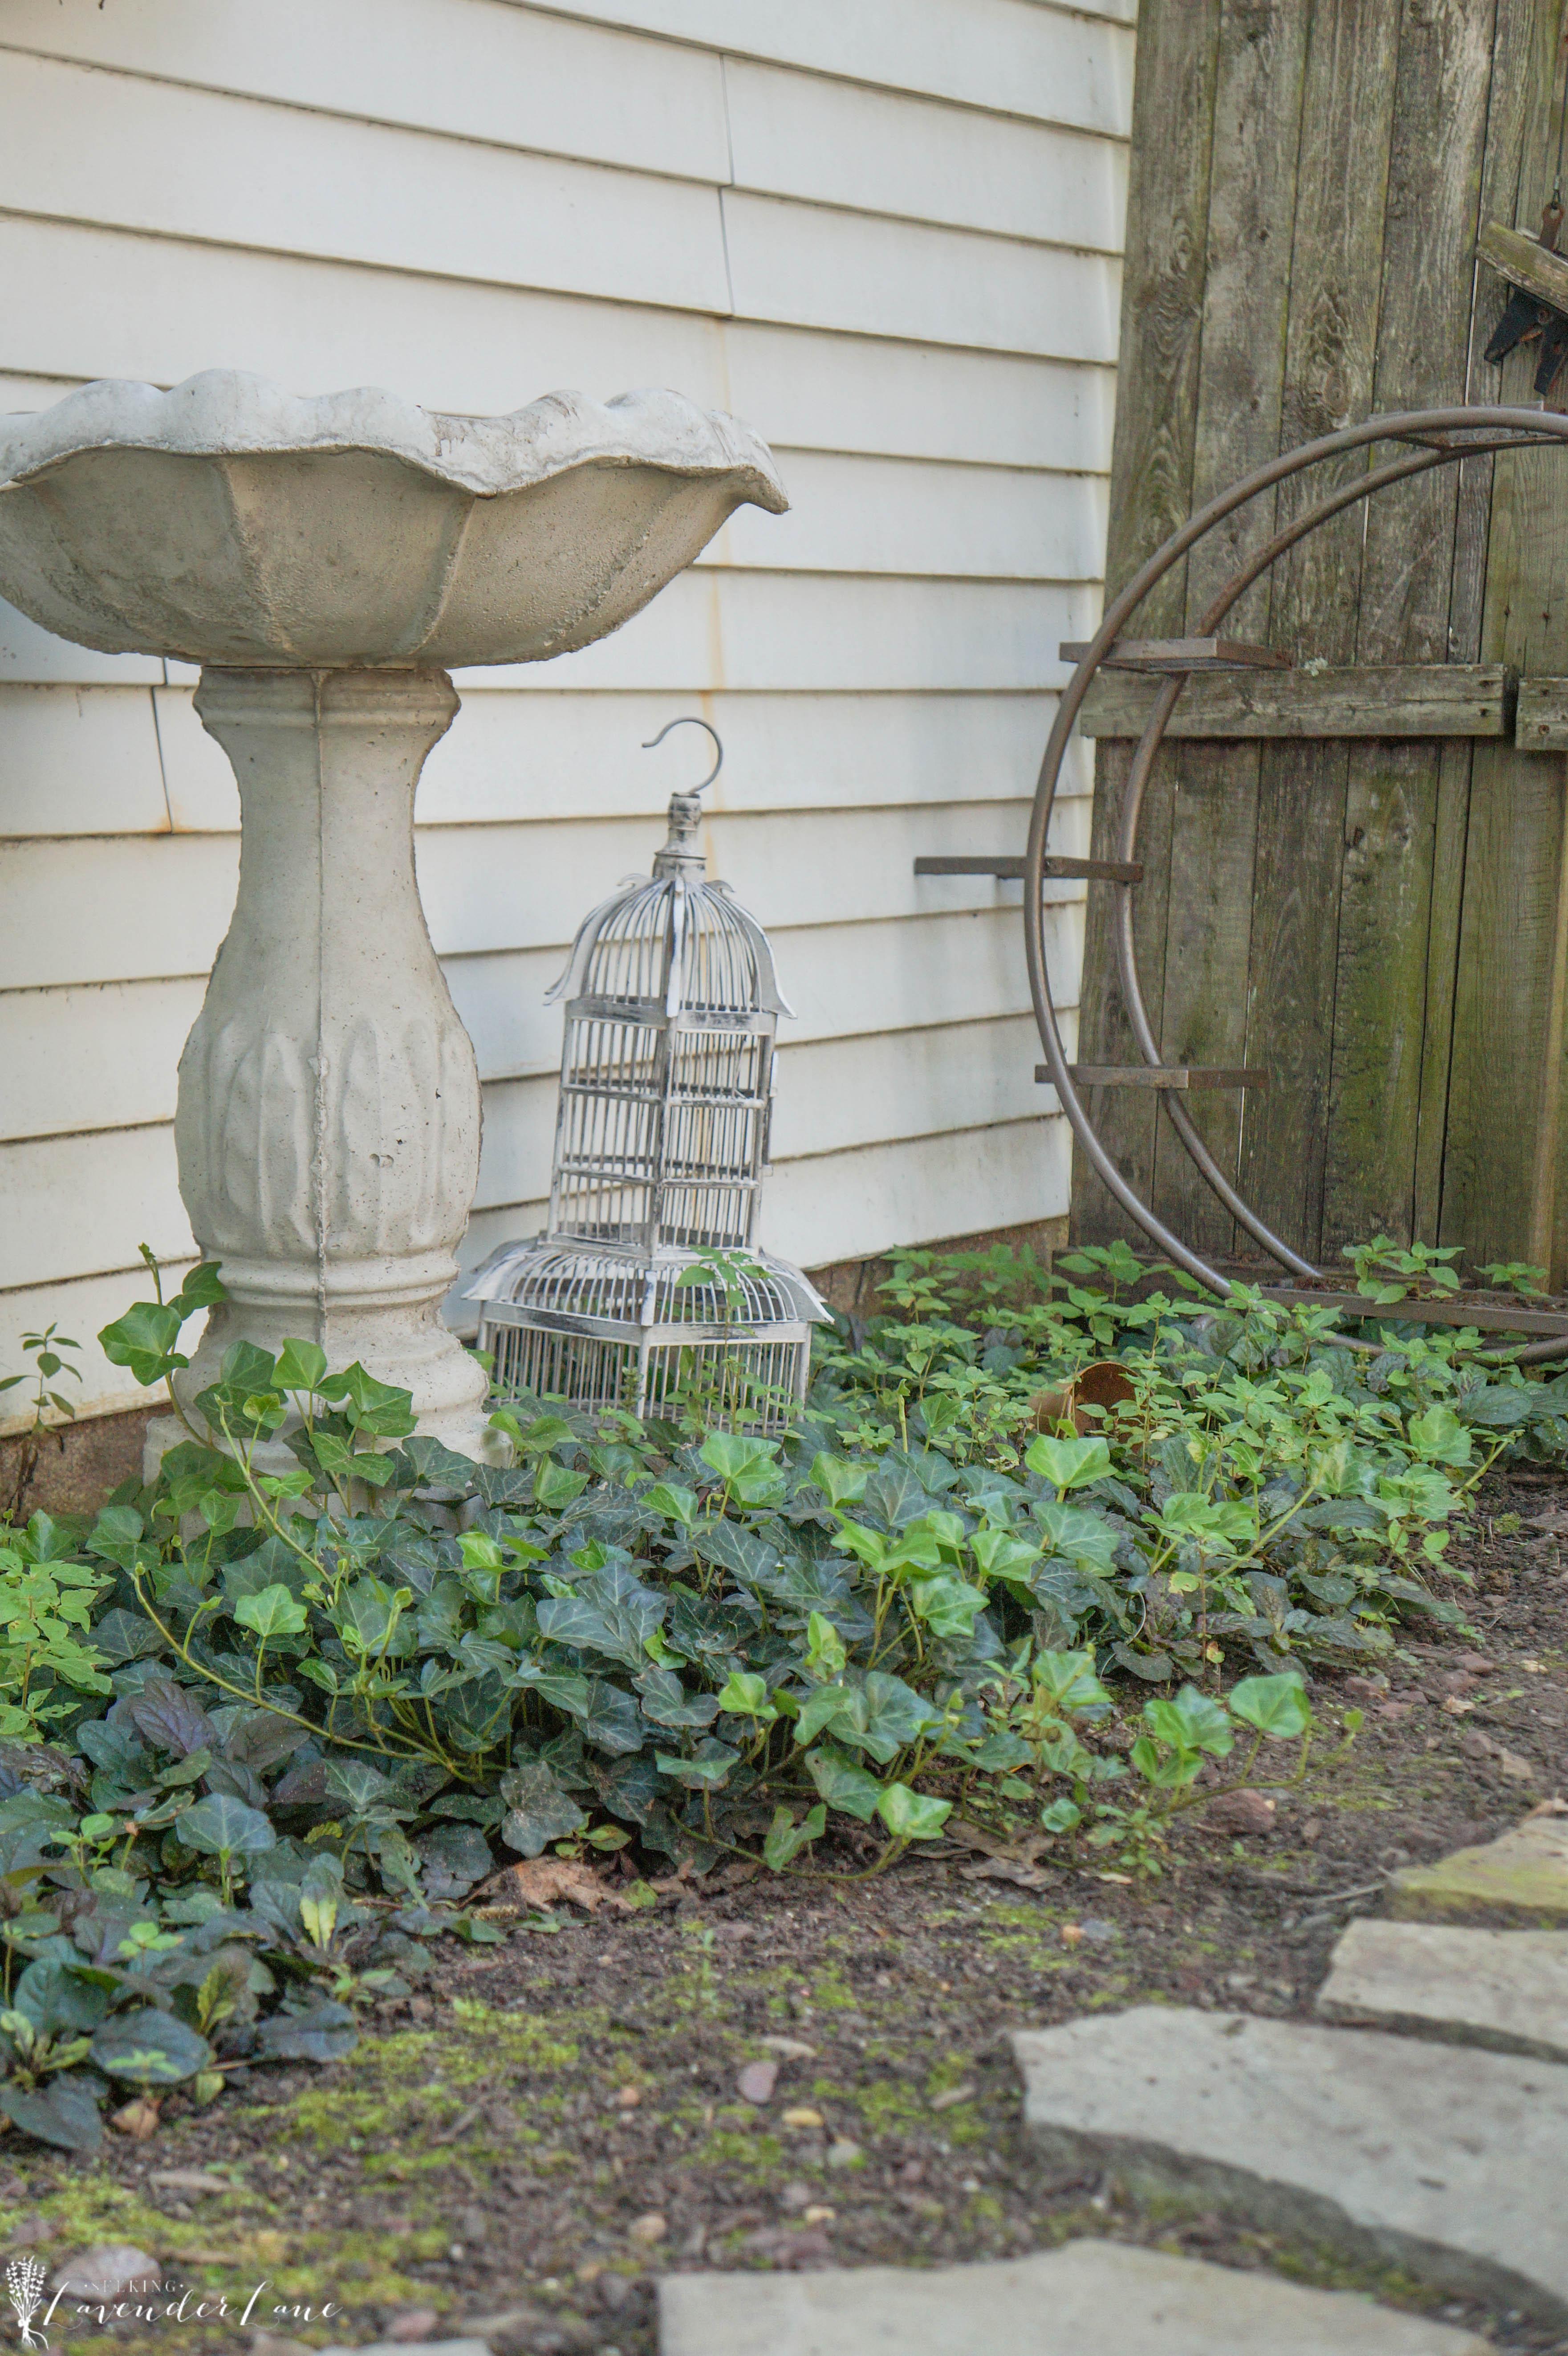 pictures of vintage herb gardens | Vintage Herb Garden - Seeking Lavendar Lane